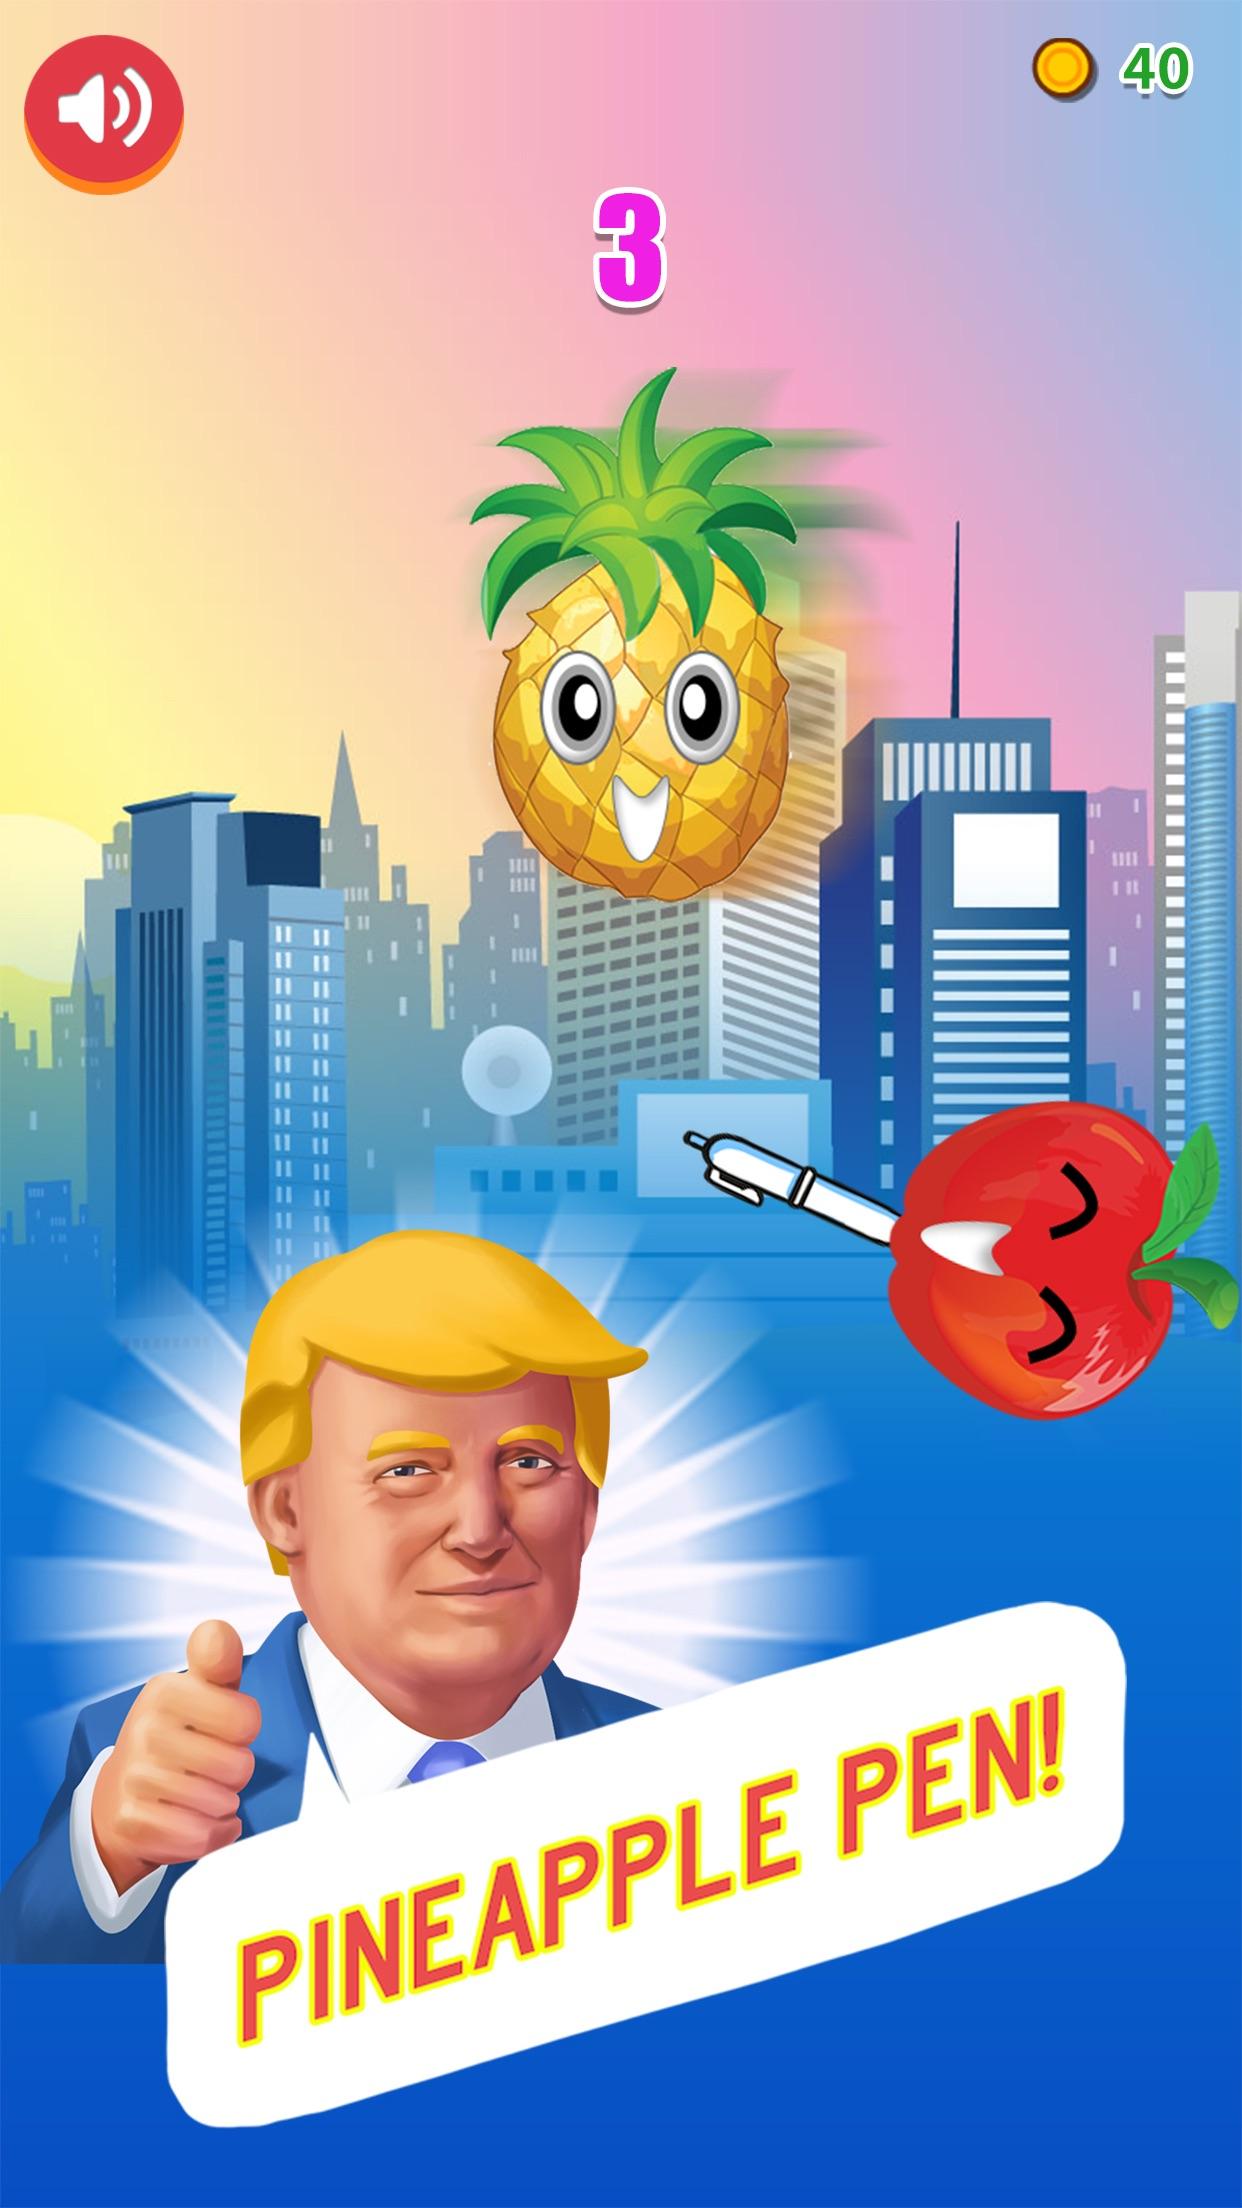 Trump Pineapple Pen Long Challenge - I have a pen Screenshot